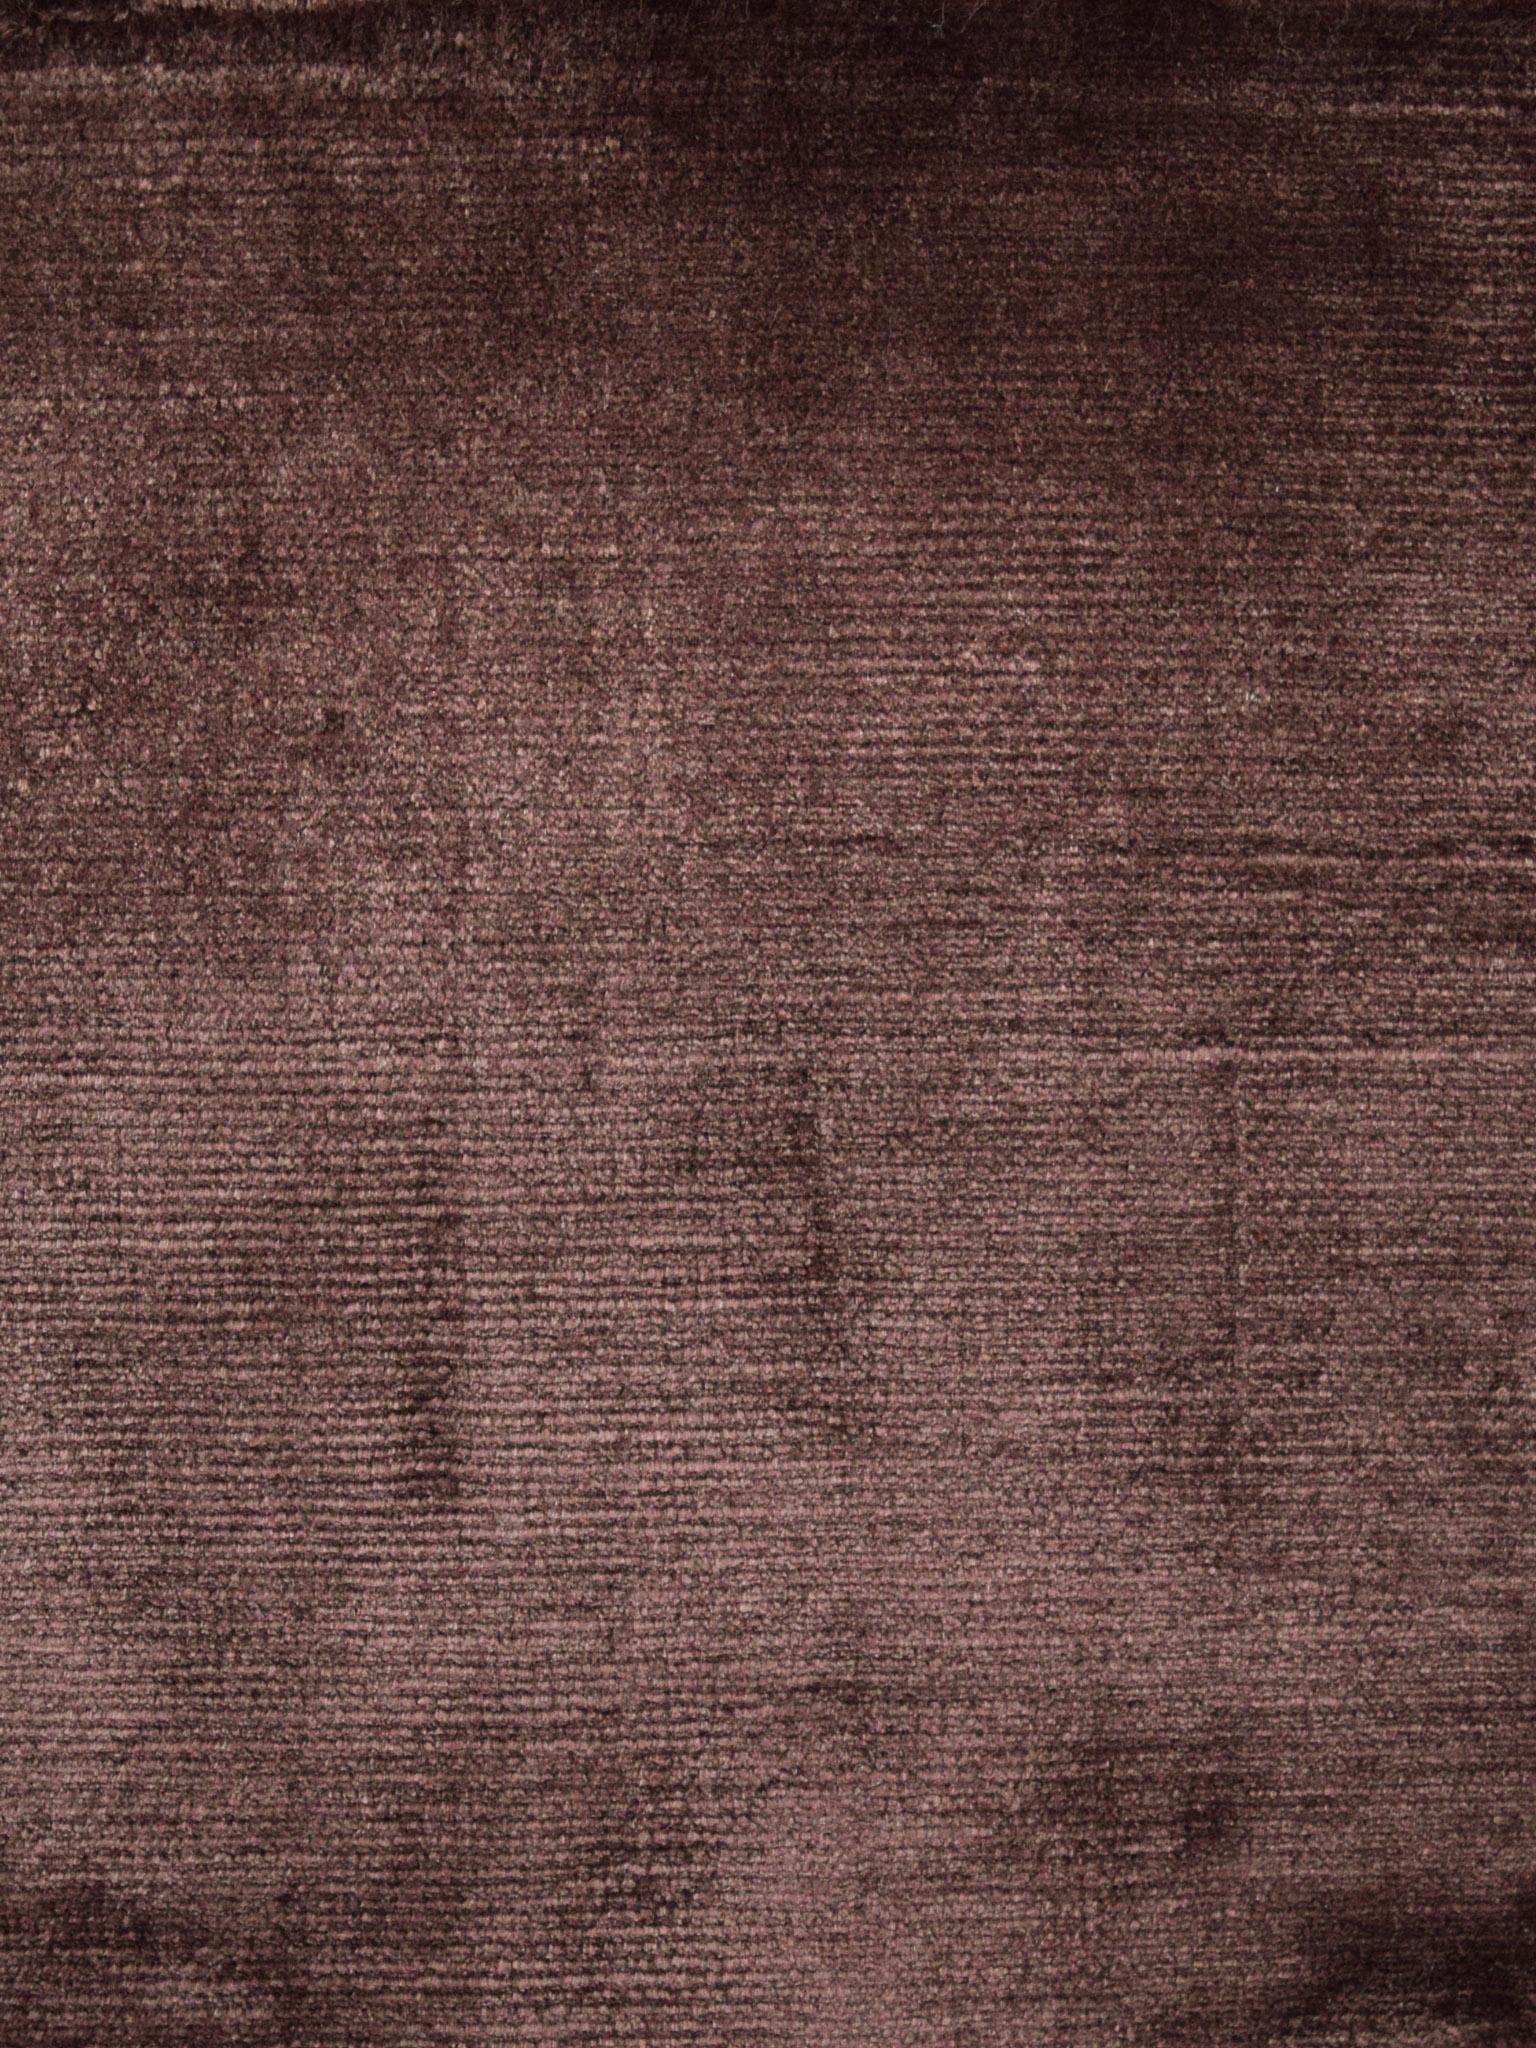 Muga Silk Solid HSPSA16113/319